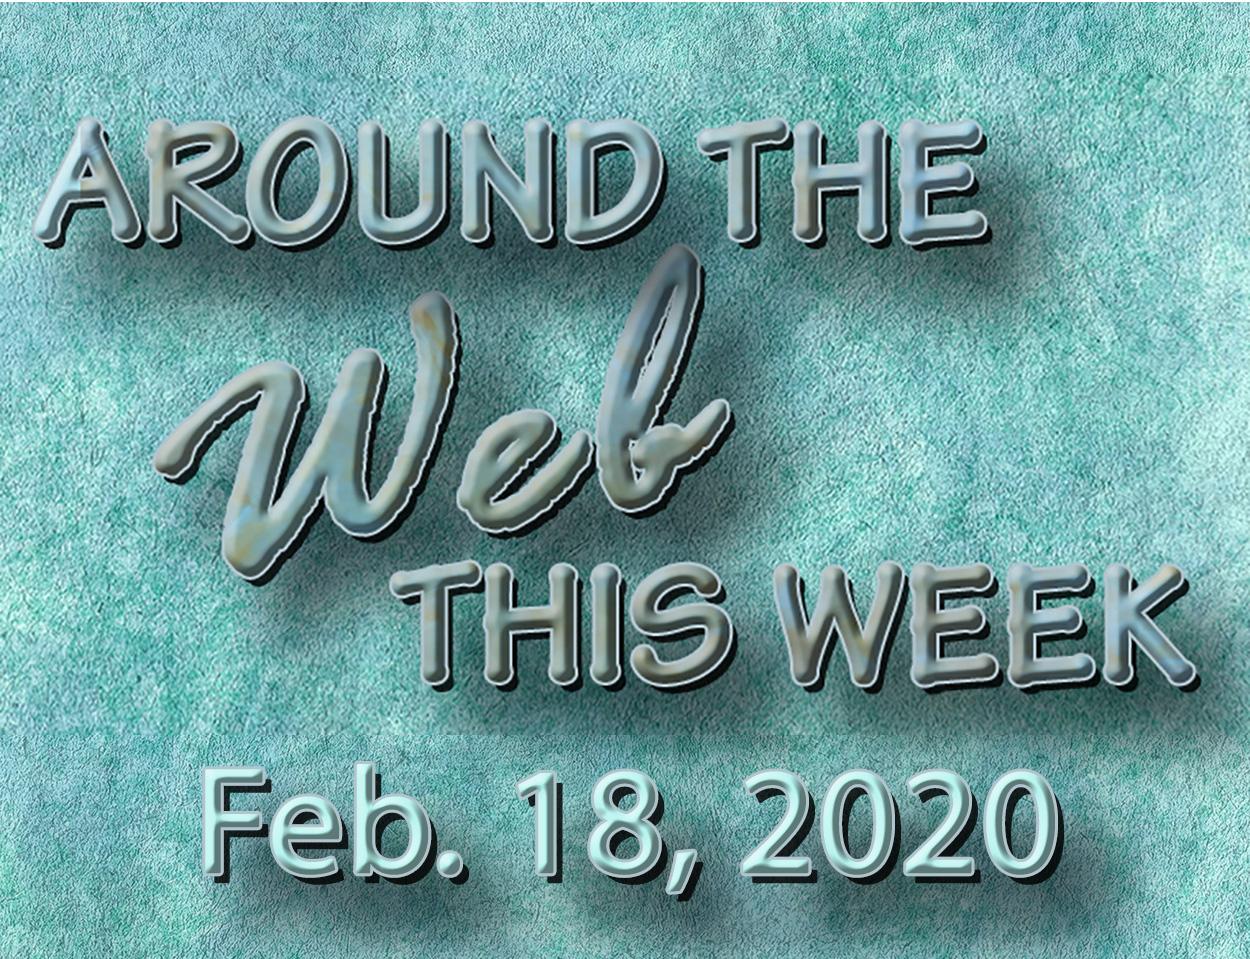 Around the Web Feb. 18